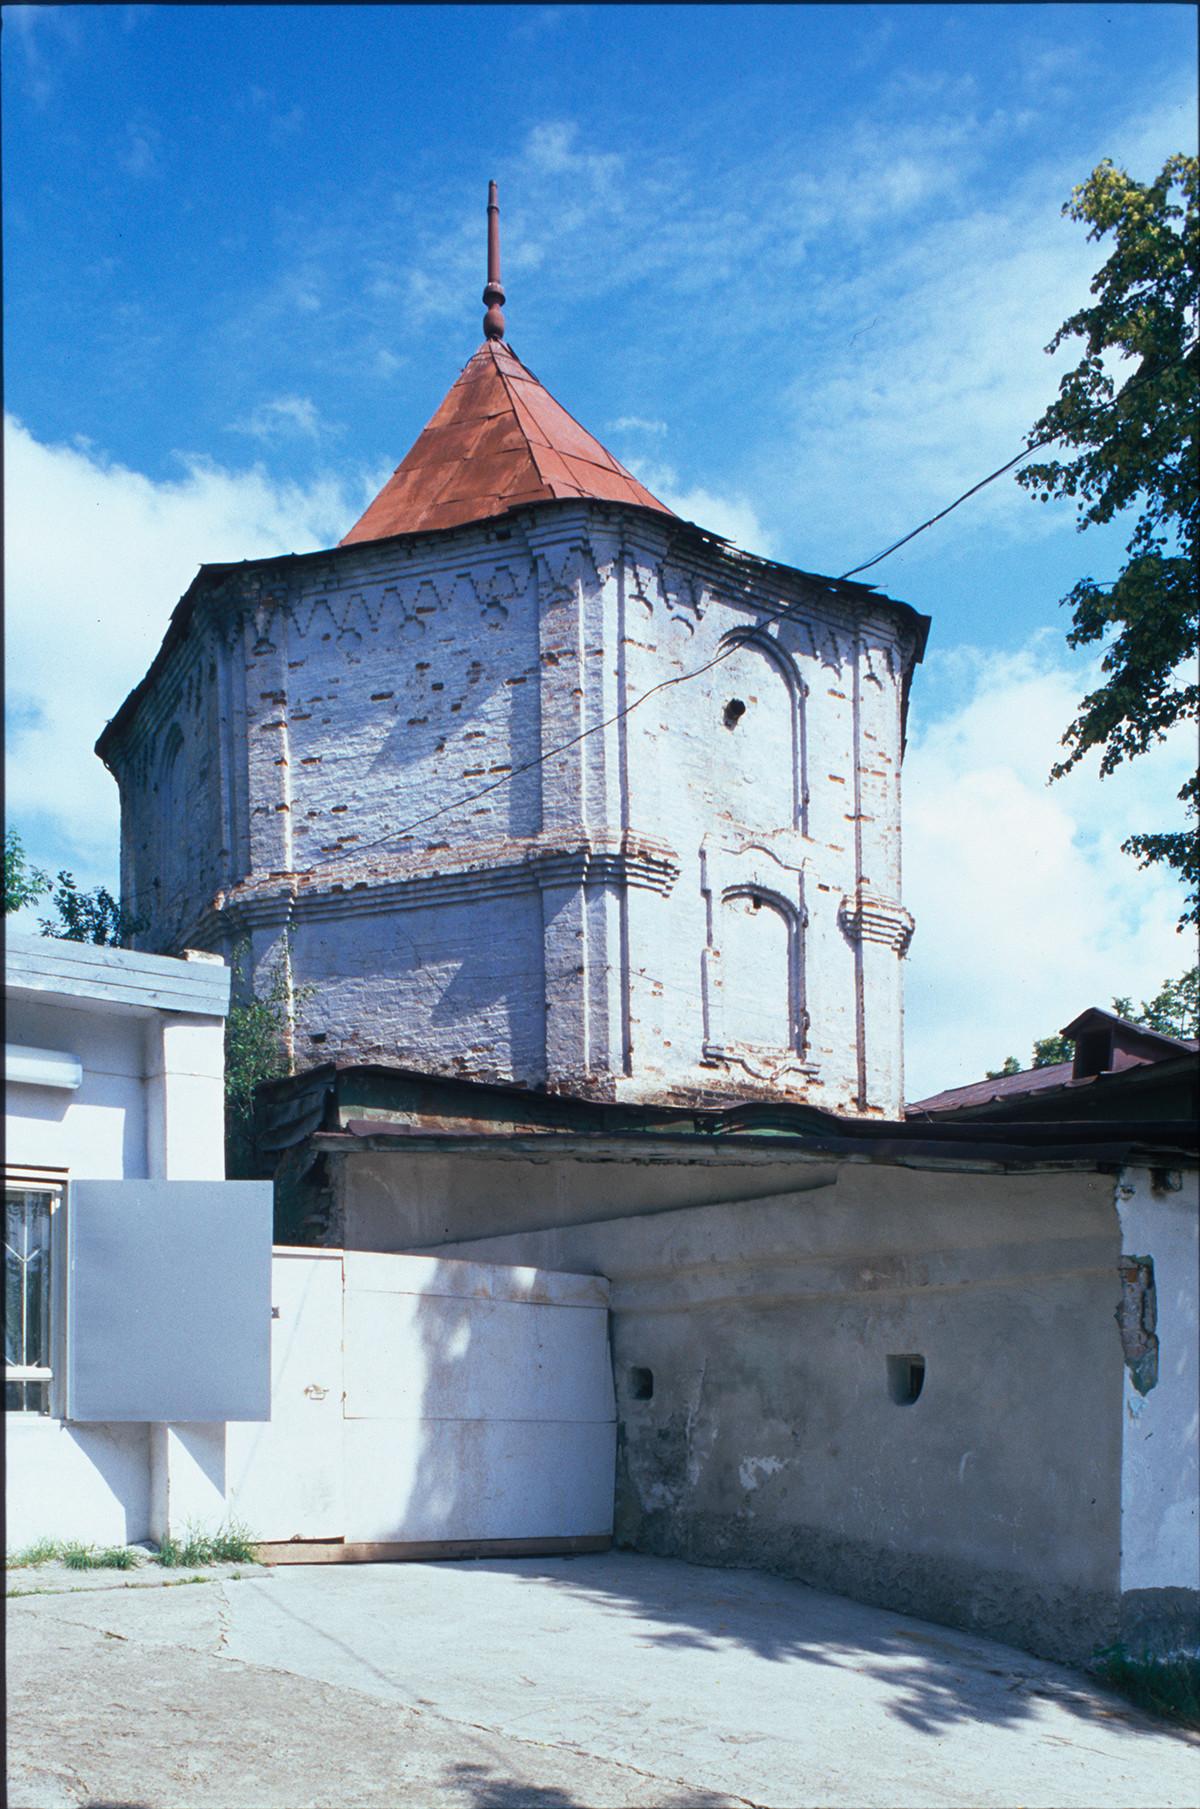 Tower on former Demidov estate at Kyshtym factory. Built ca. 1760 by Nikita Demidov. July 14, 2003.